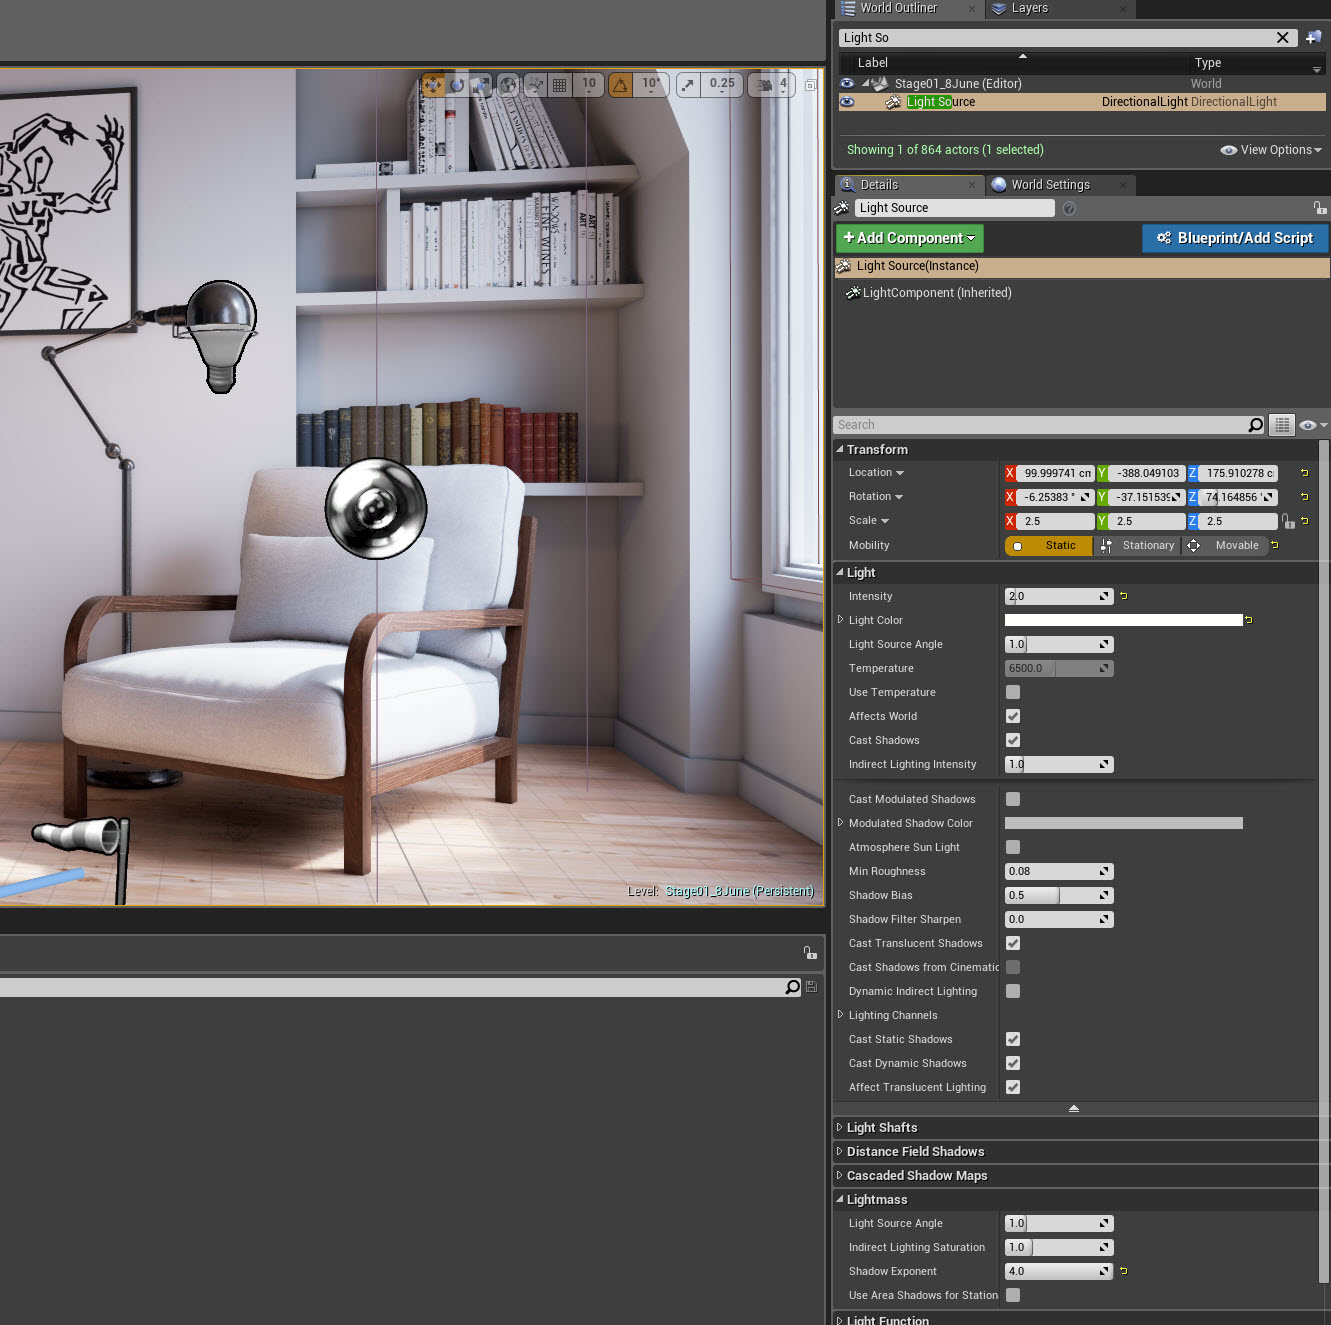 Basic-Interior-DirectLIghtSource.jpg